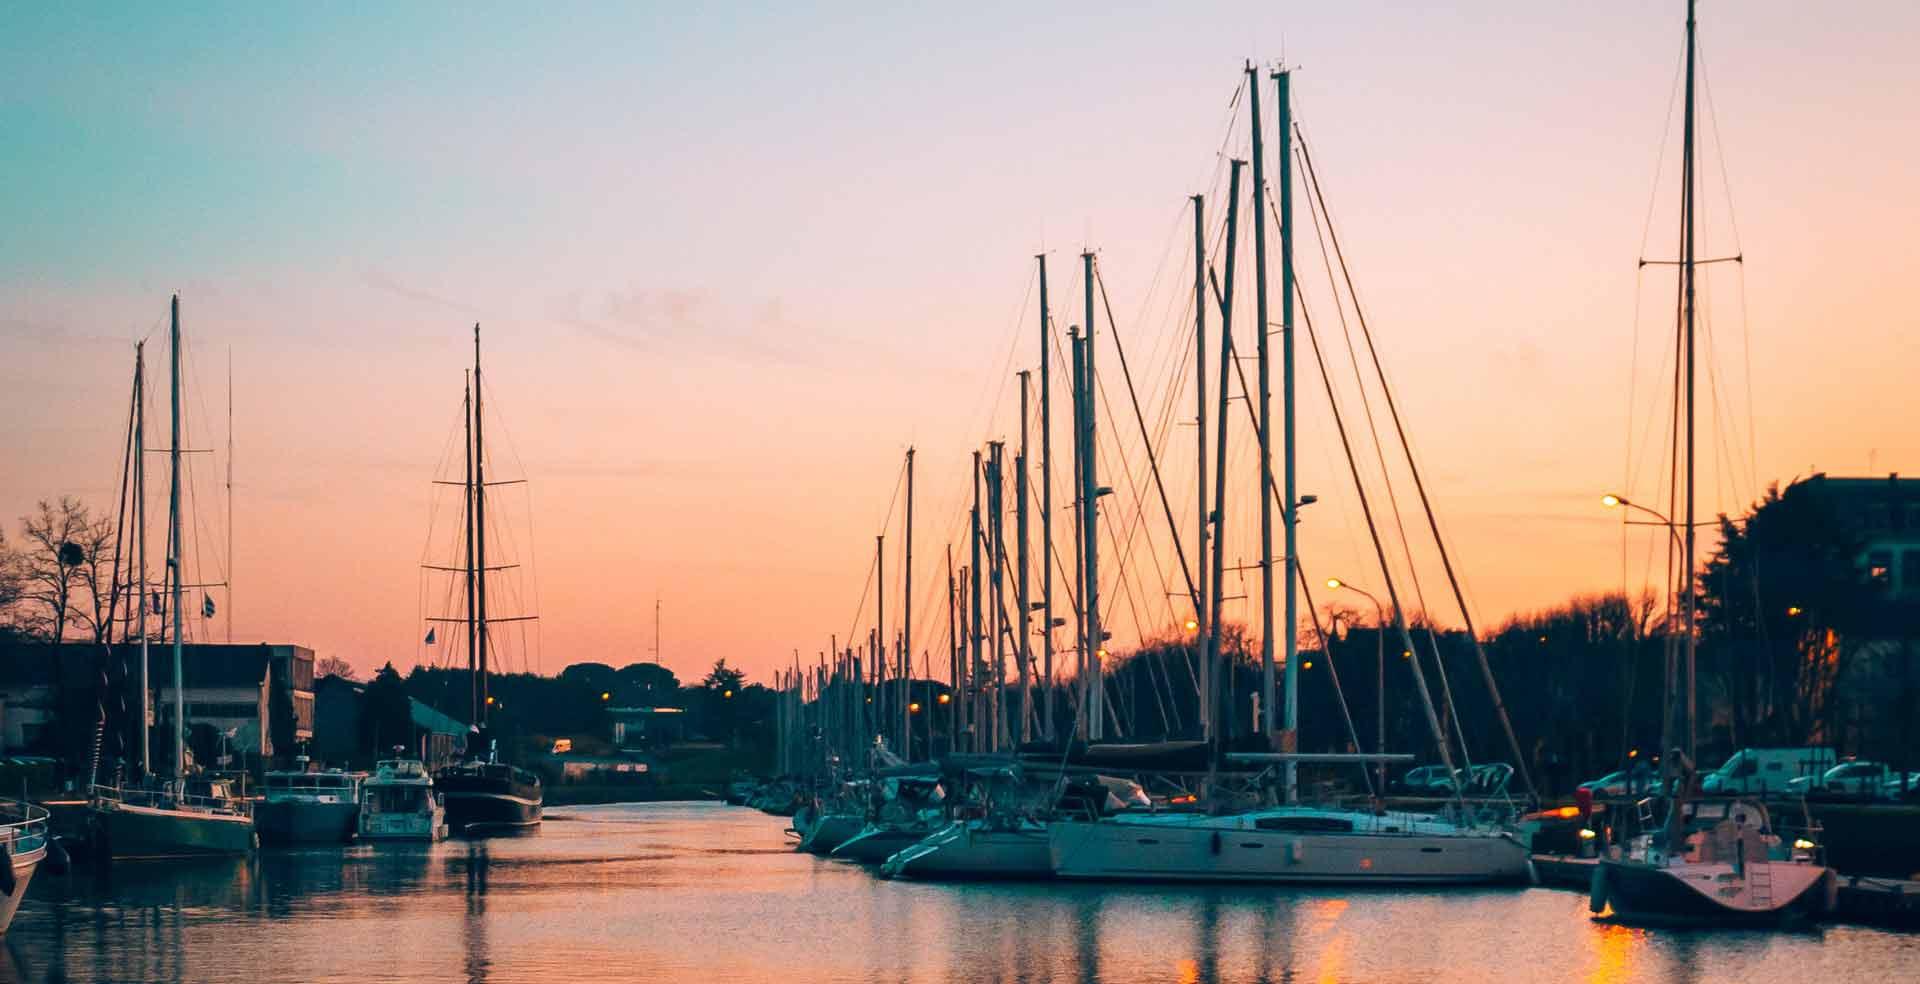 port croisière golfe du Morbihan